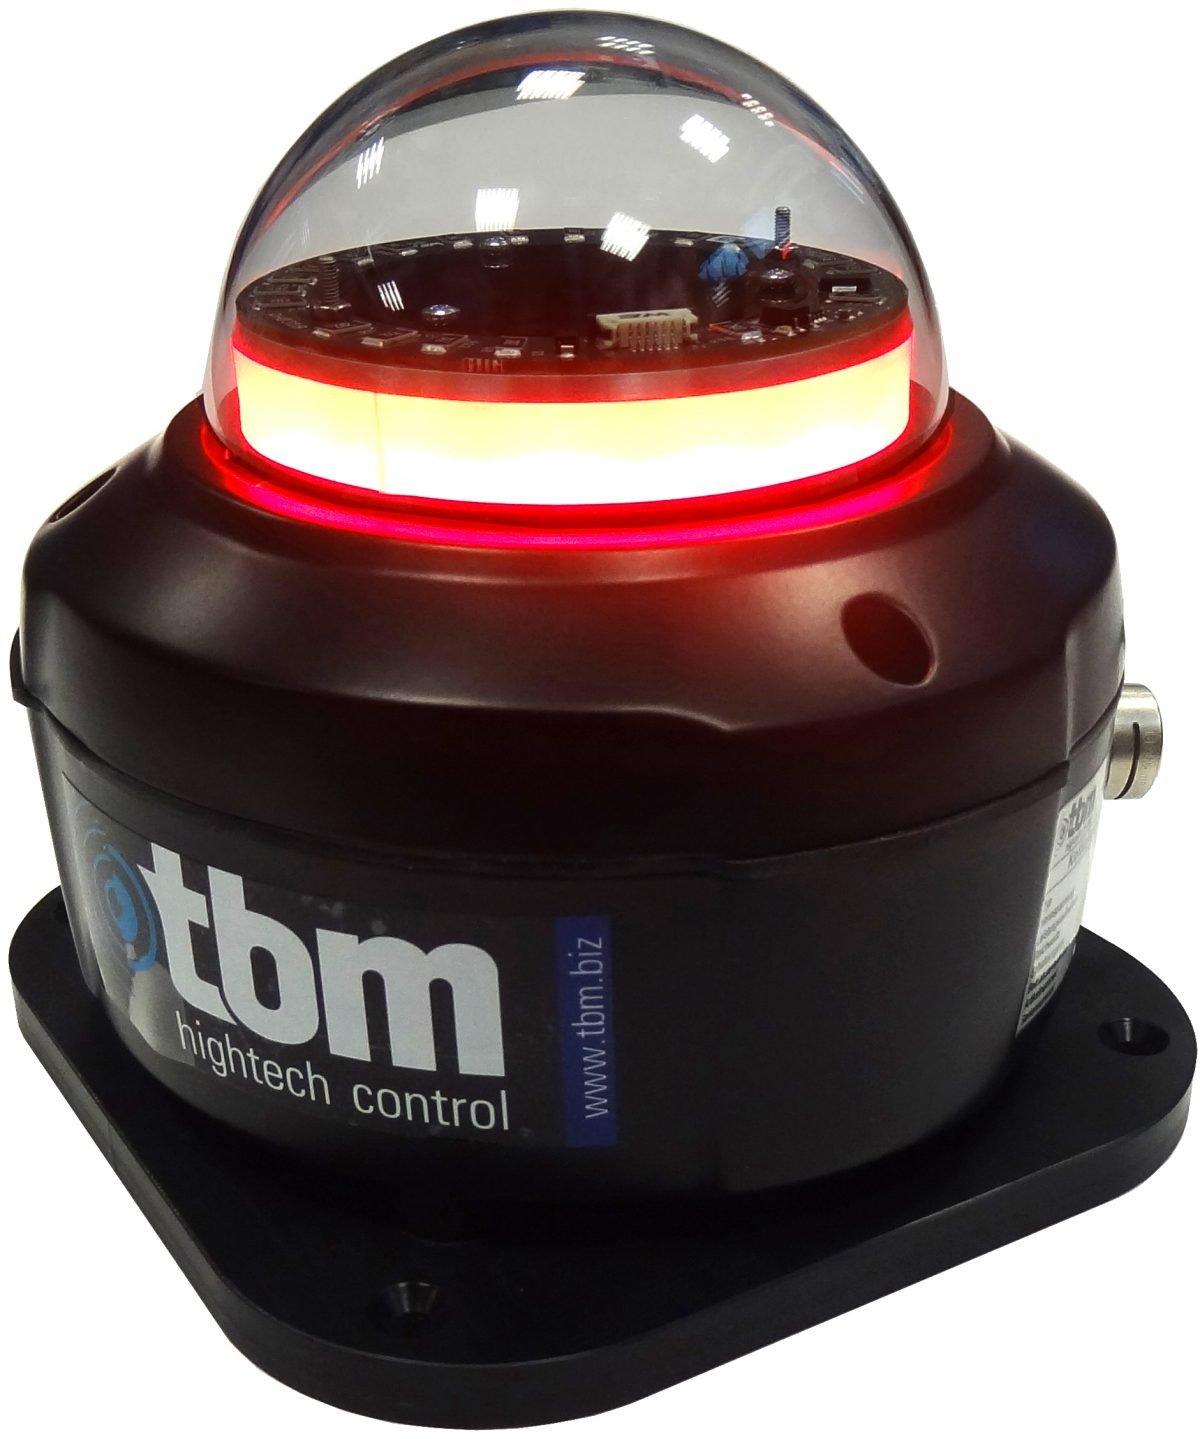 © tbm hightech control GmbH